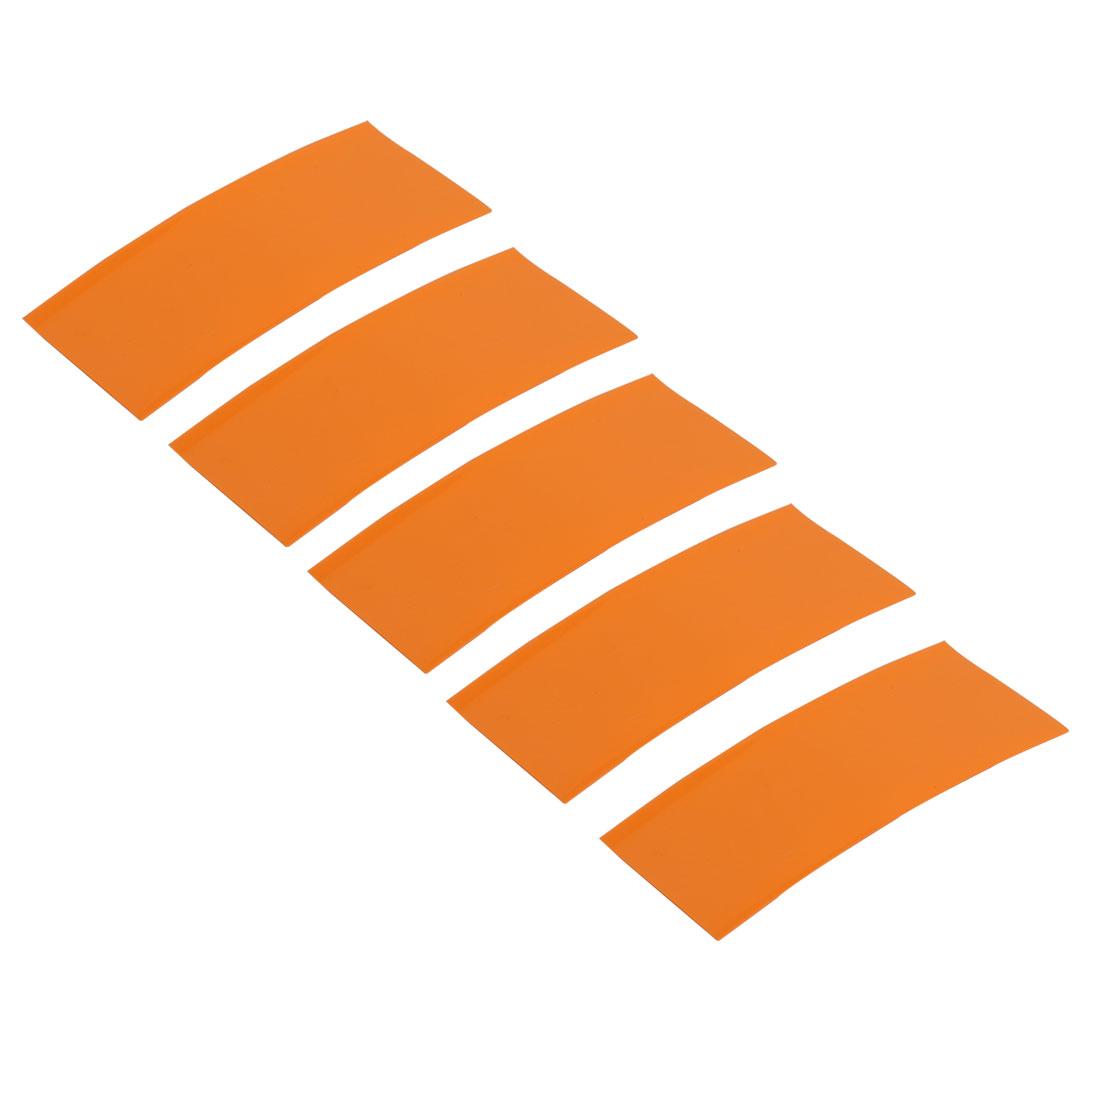 5pcs 23mm Width 53mm Long PVC Heat Shrinkable Tube Orange for AA Battery Pack